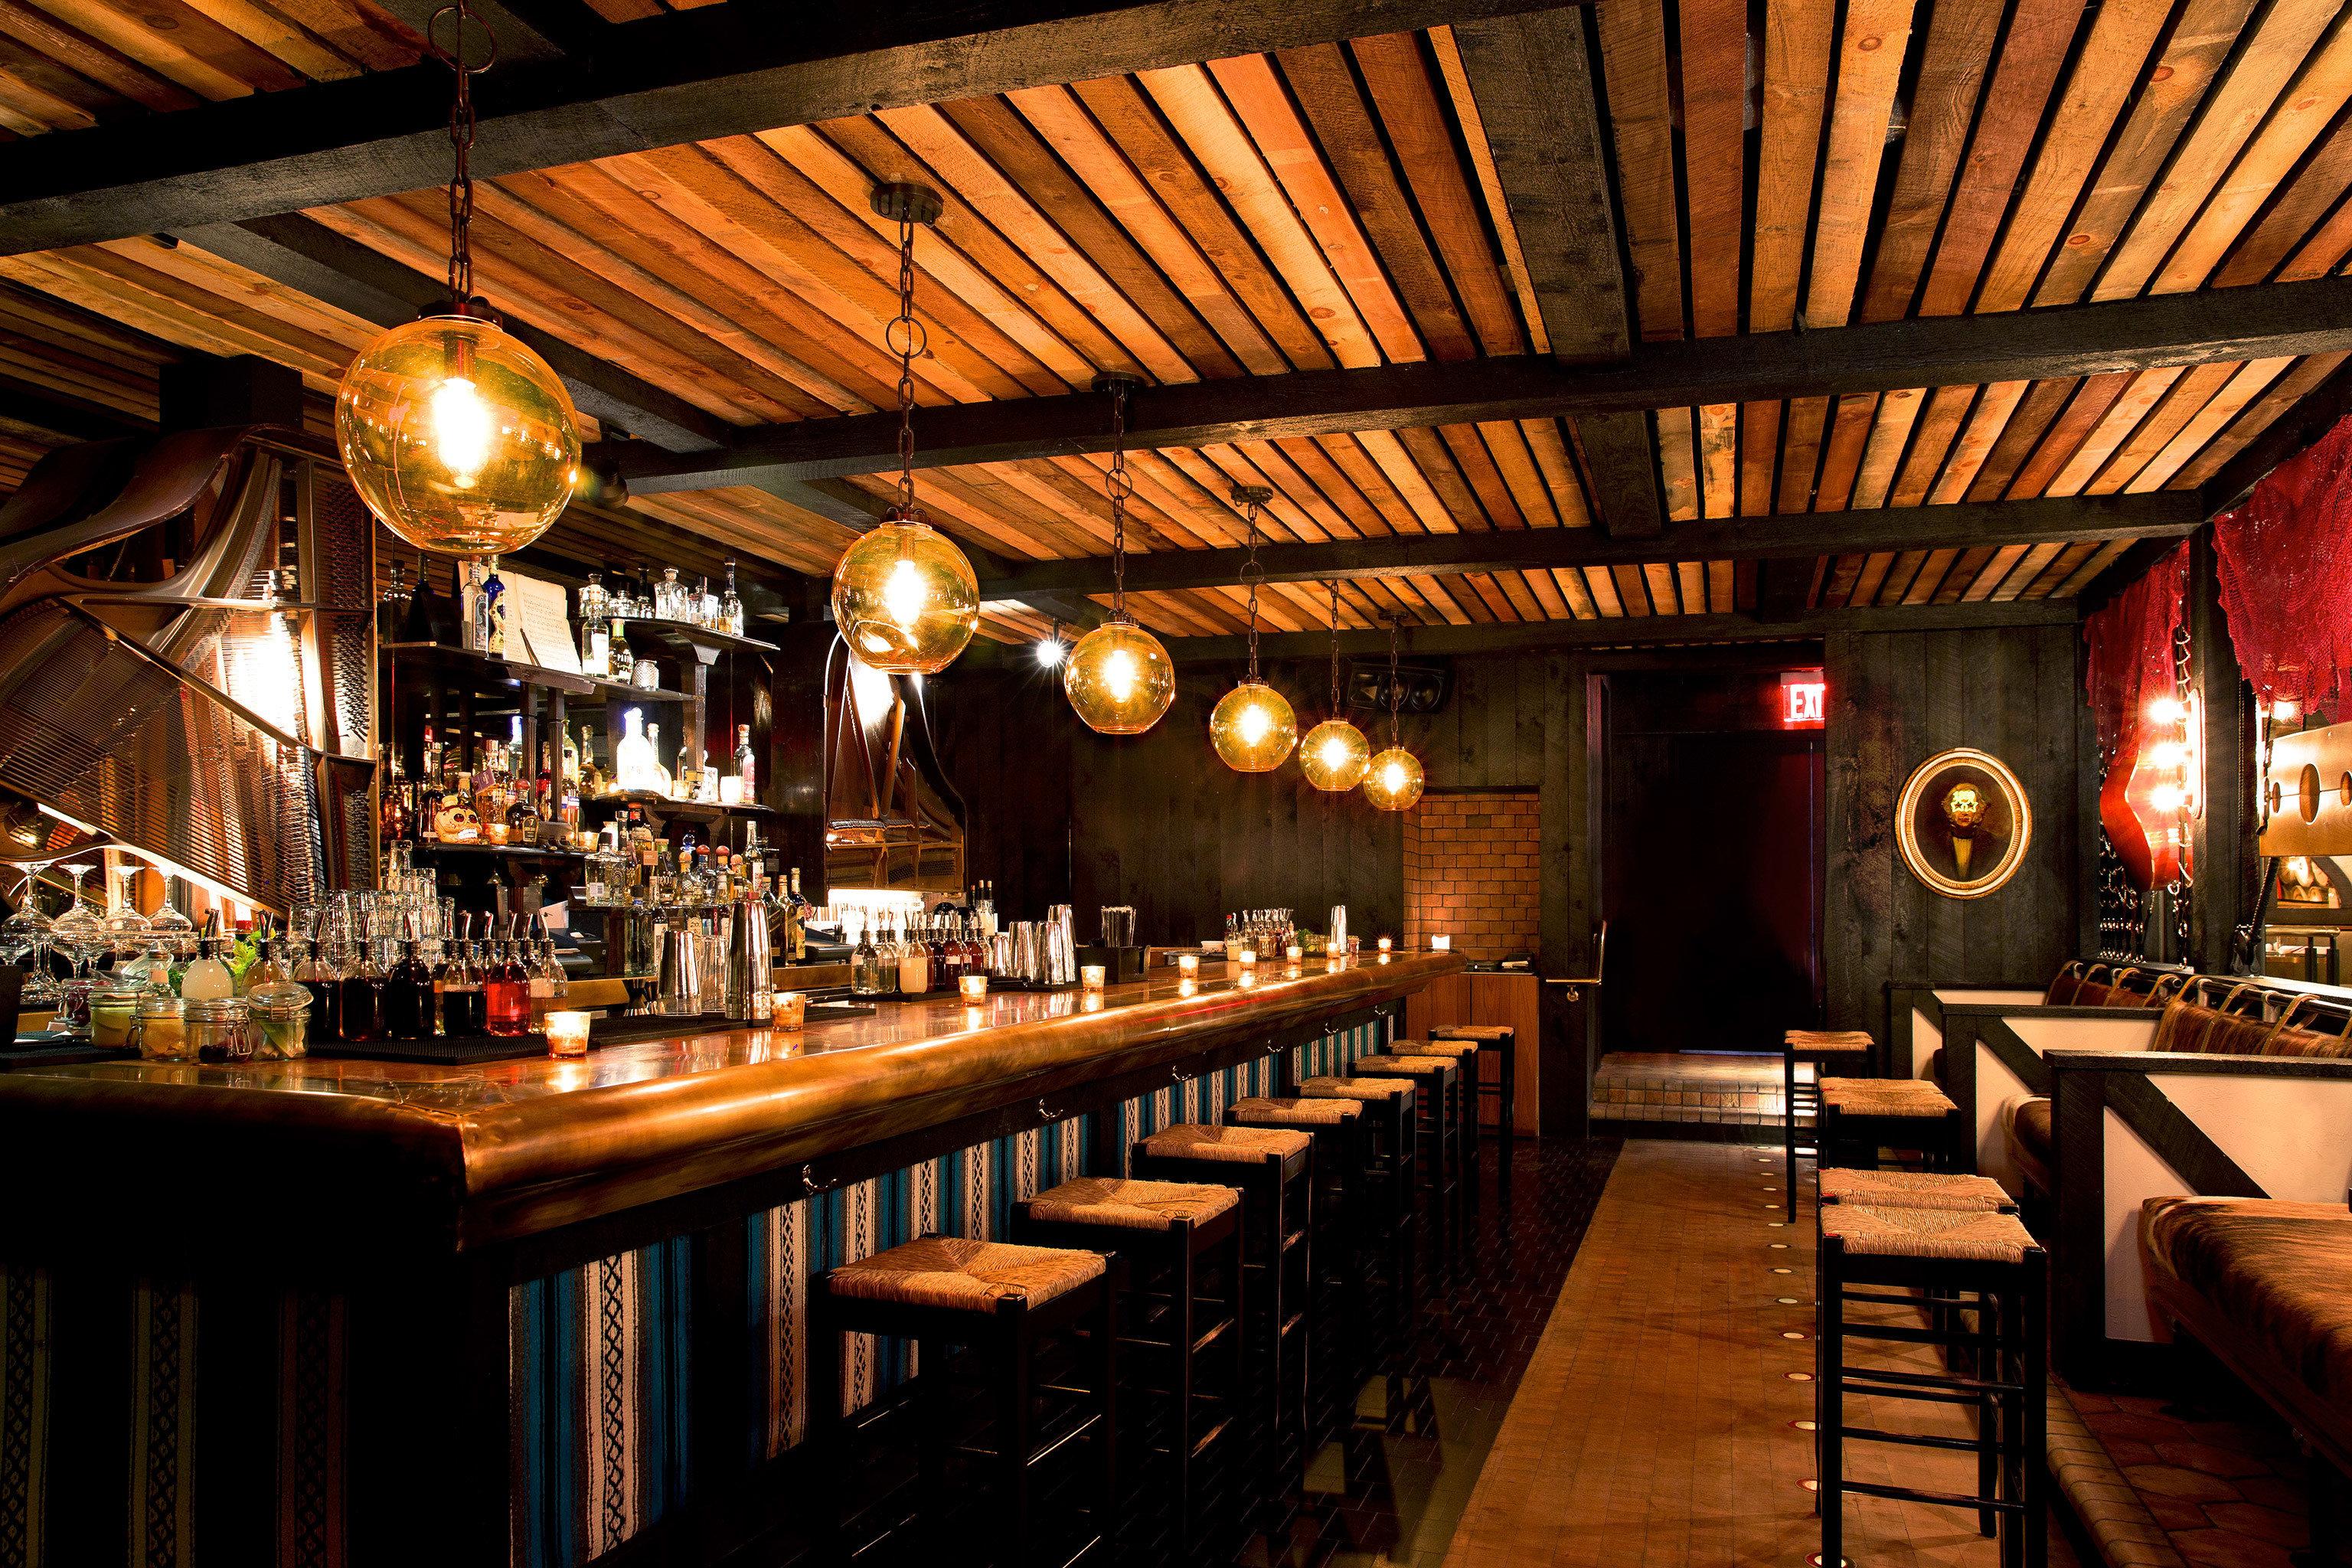 Bar Dining Drink Eat Hip Modern man made object restaurant Winery tavern